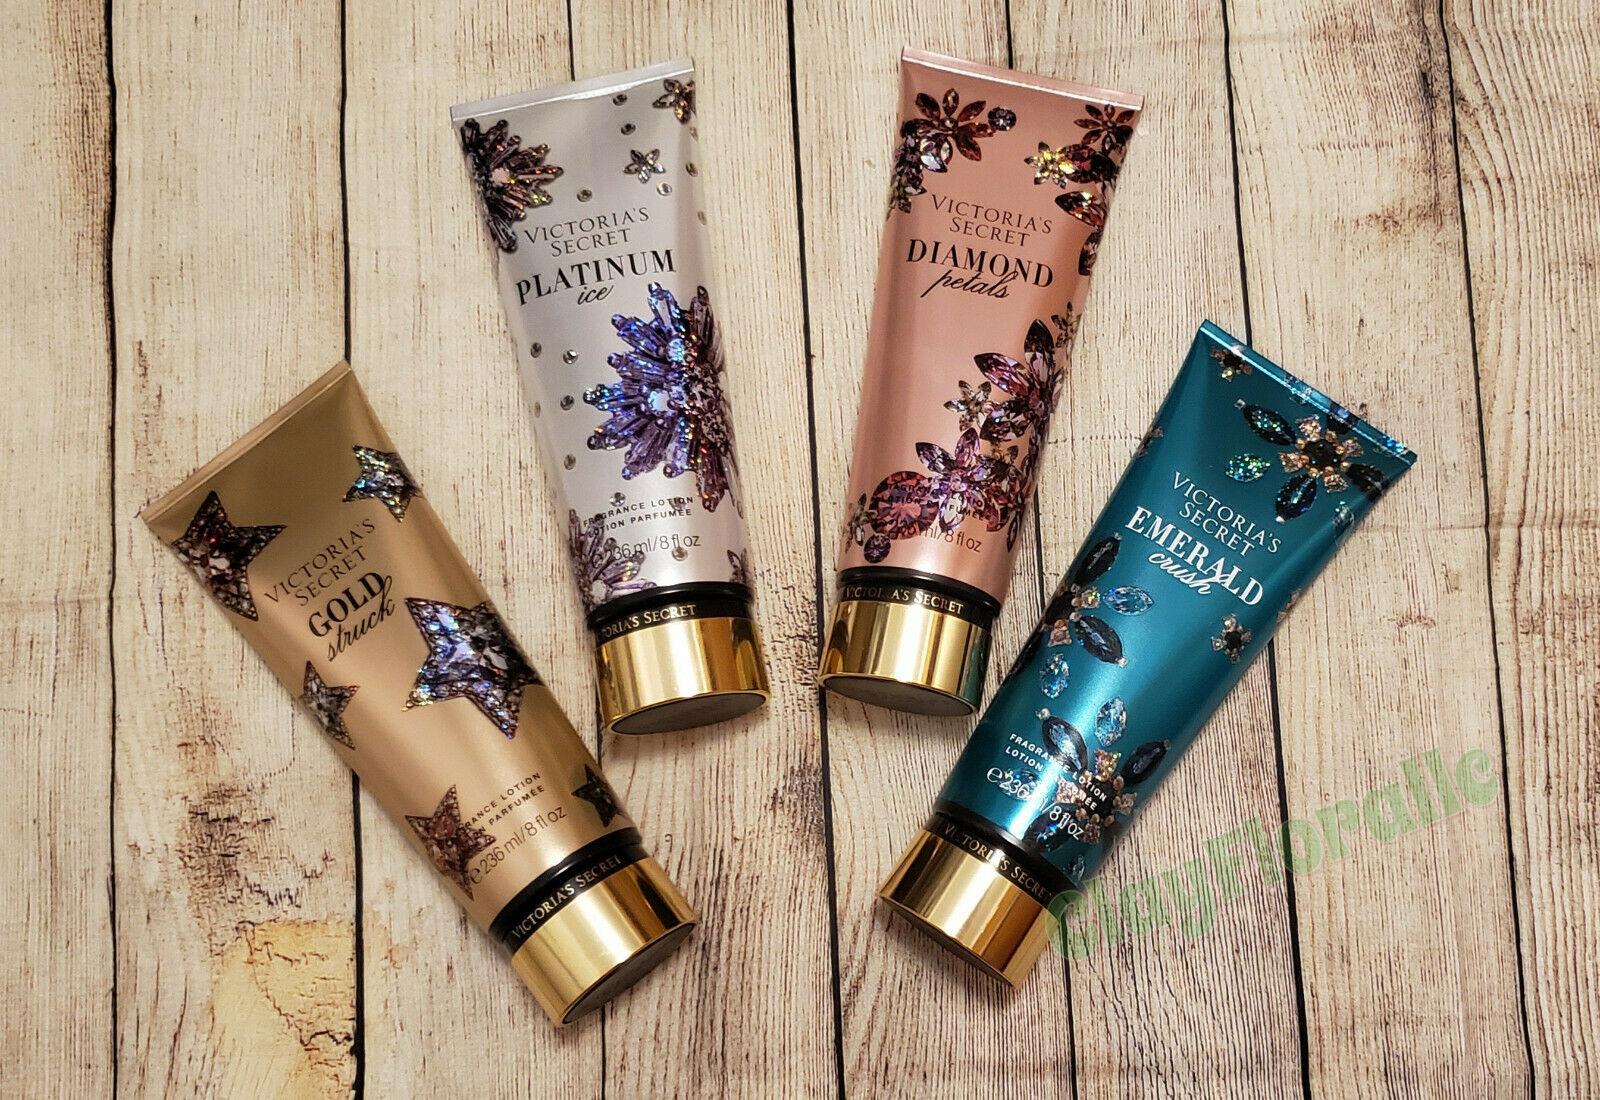 Platinum Ice - Diamond Petals - Gold Struck Victoria's Secret Winter Dazzle Fragrance Lotion 236ml